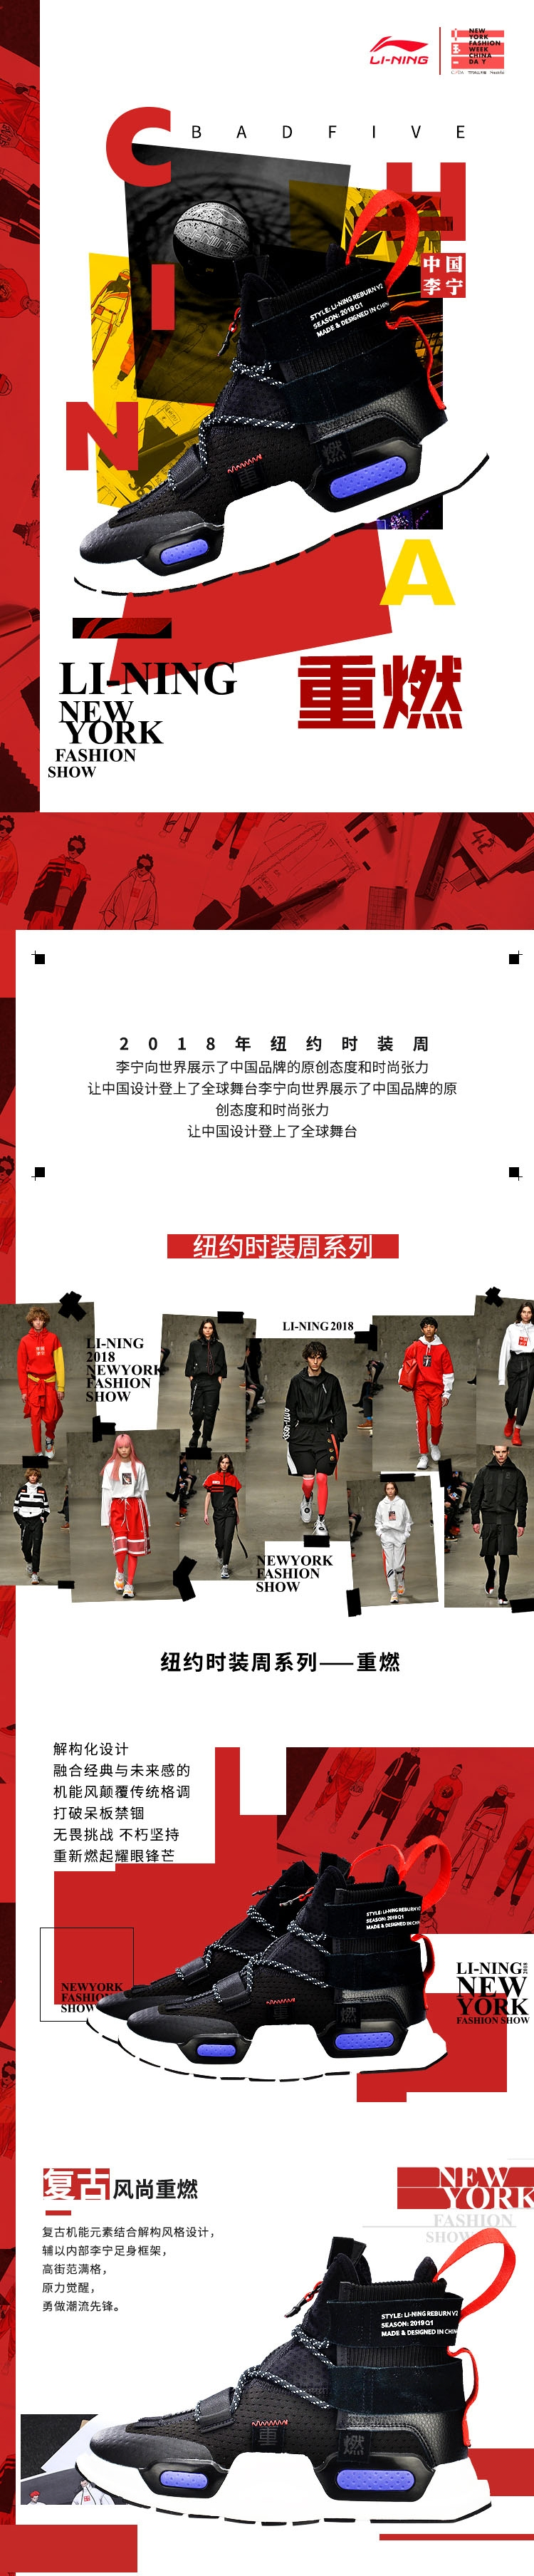 2019 Spring New New York Fashion Week X China Li-Ning Series Reburn High Tops Basketball Casual Shoes